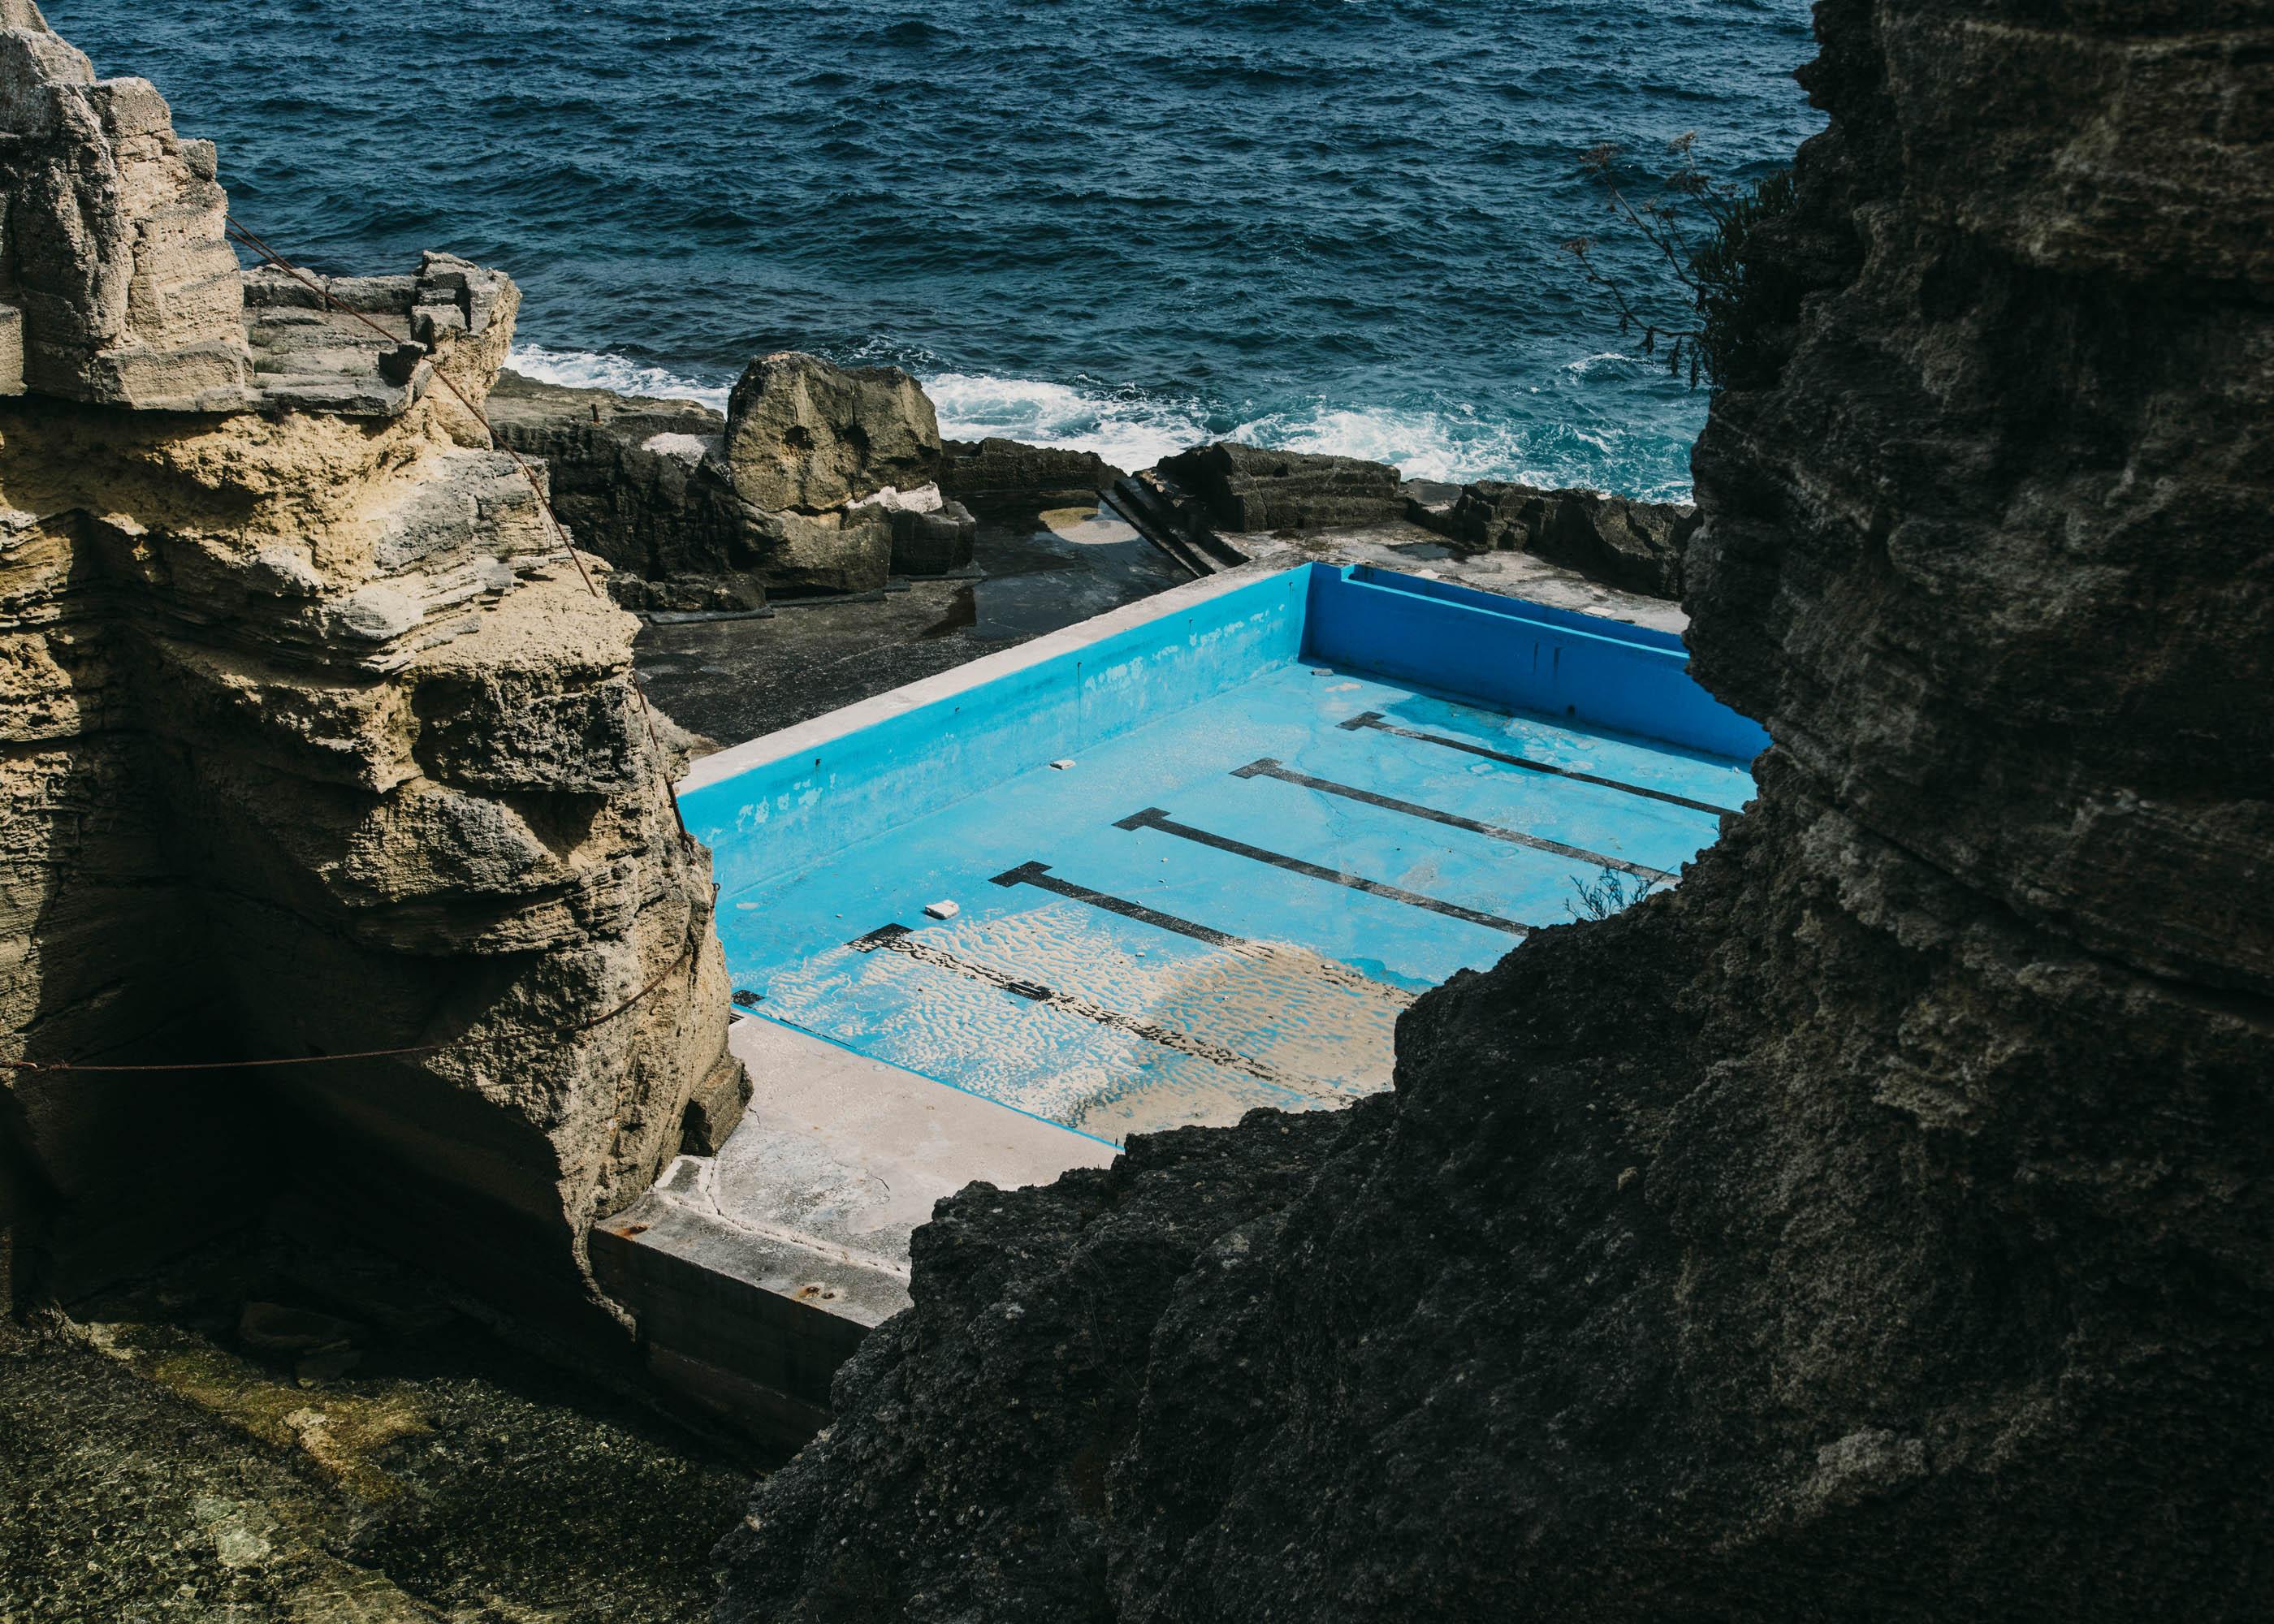 #openhouse #italy #puglia #travel #pools #blue